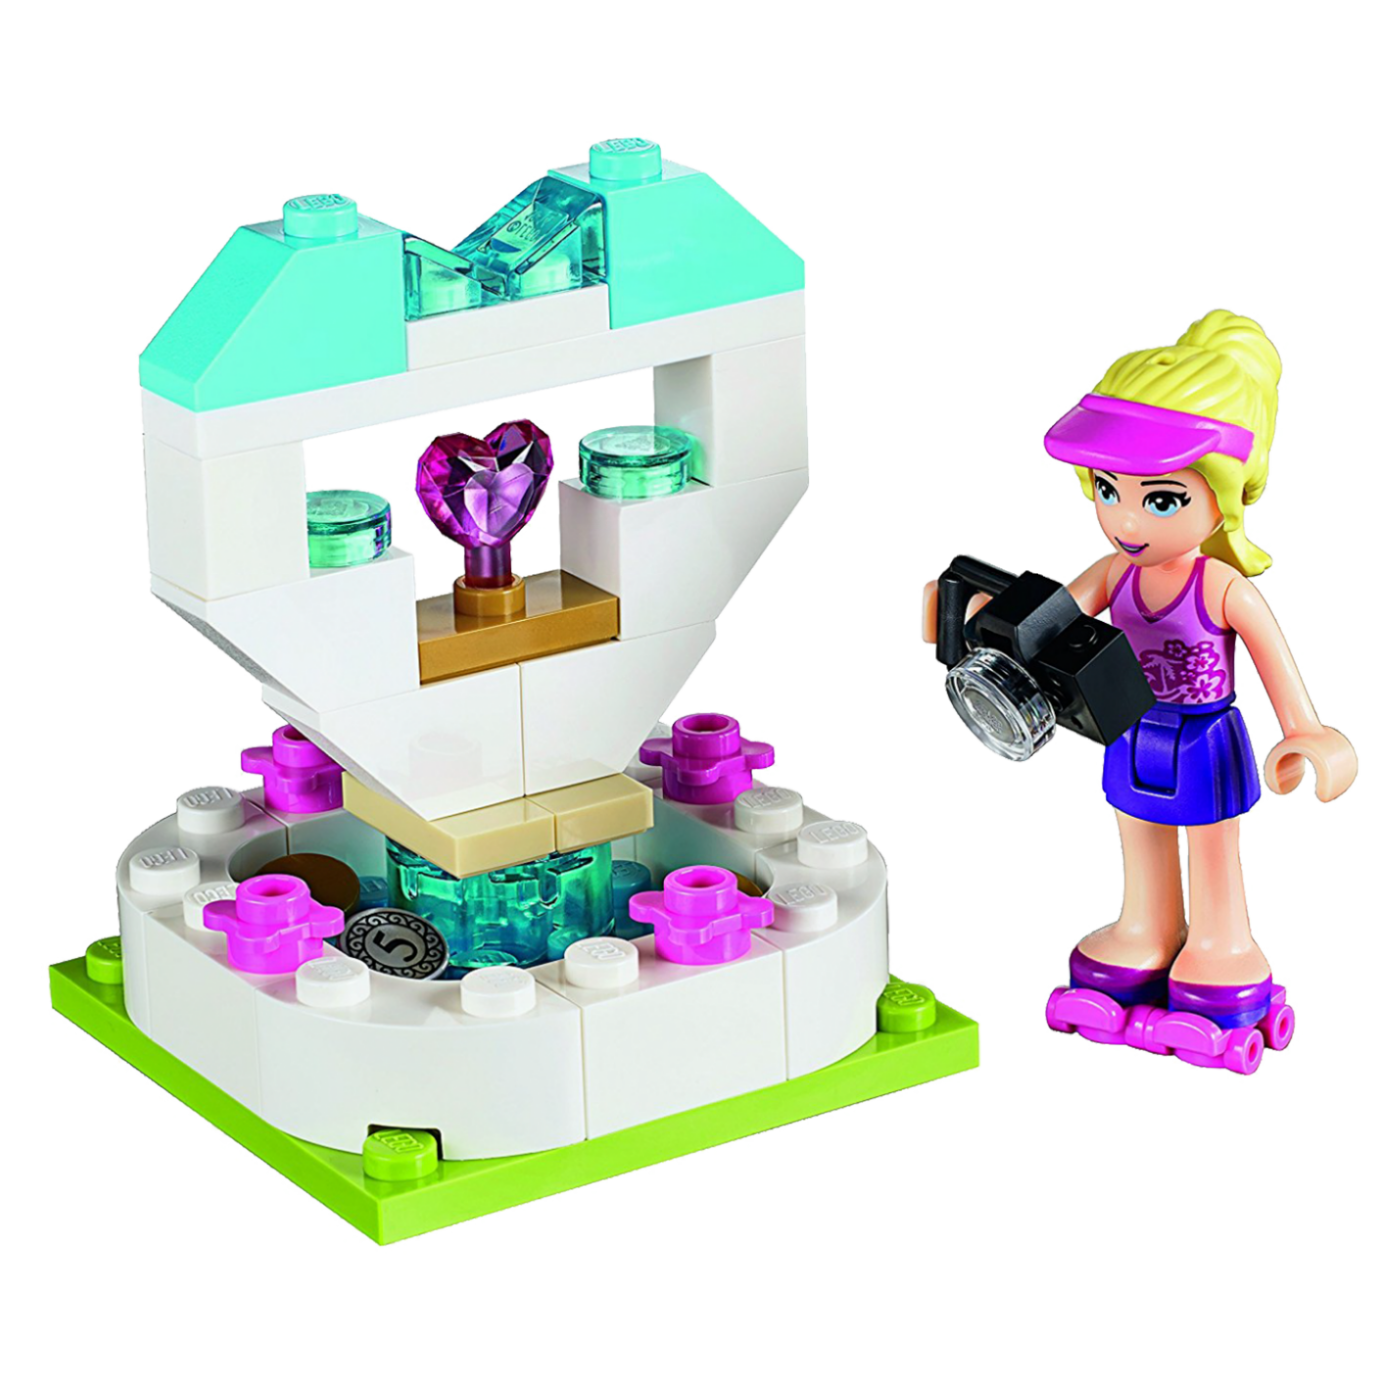 Fontana želja, LEGO Polybags